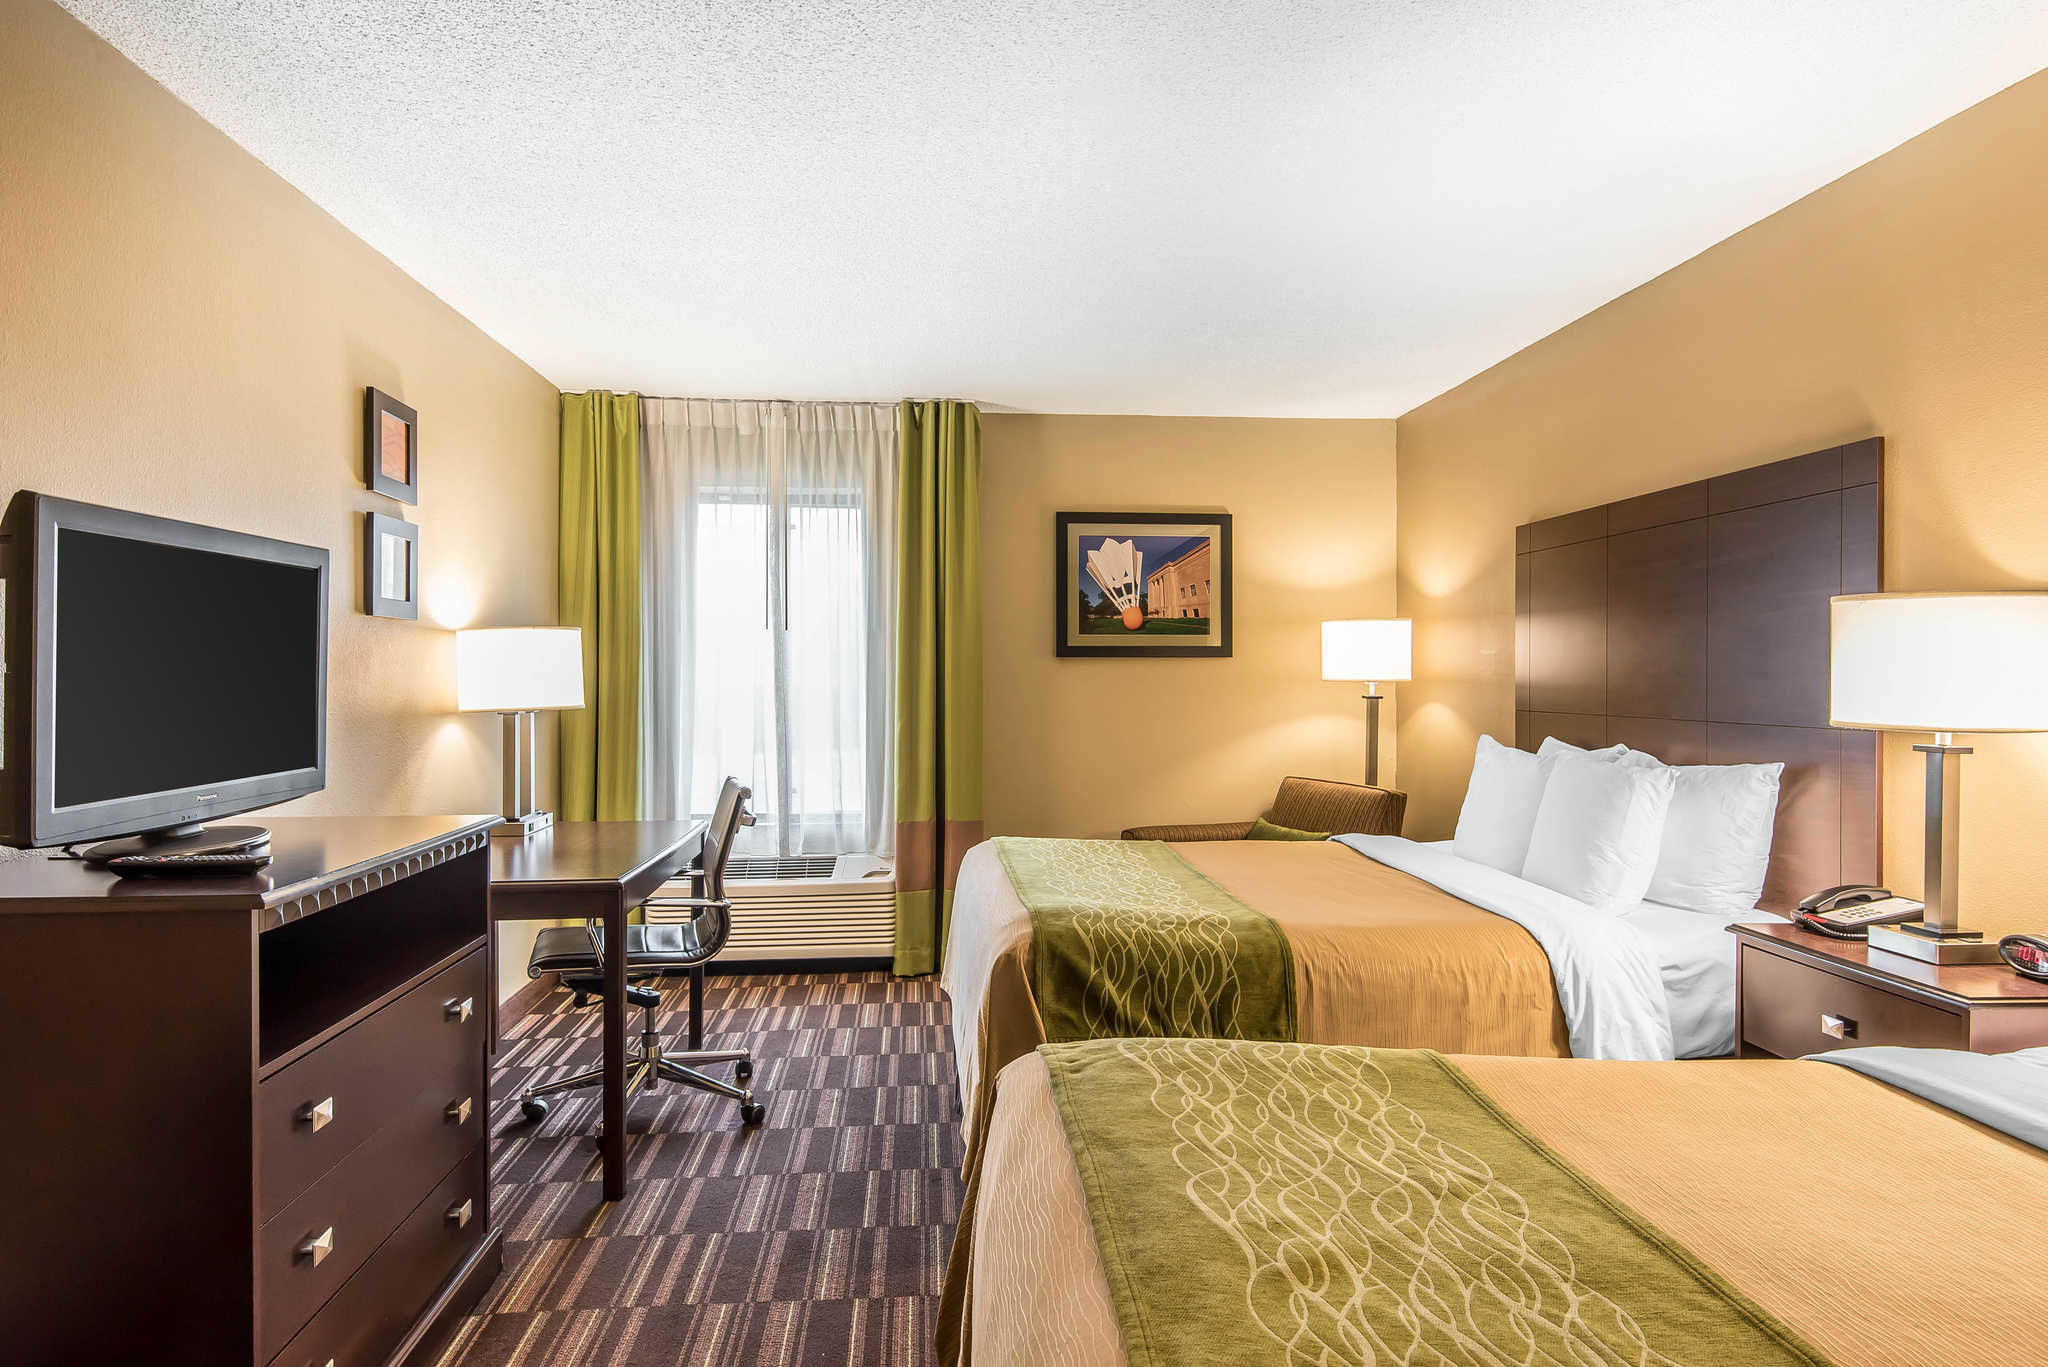 Comfort Inn & Suites Kansas City - Northeast image 15